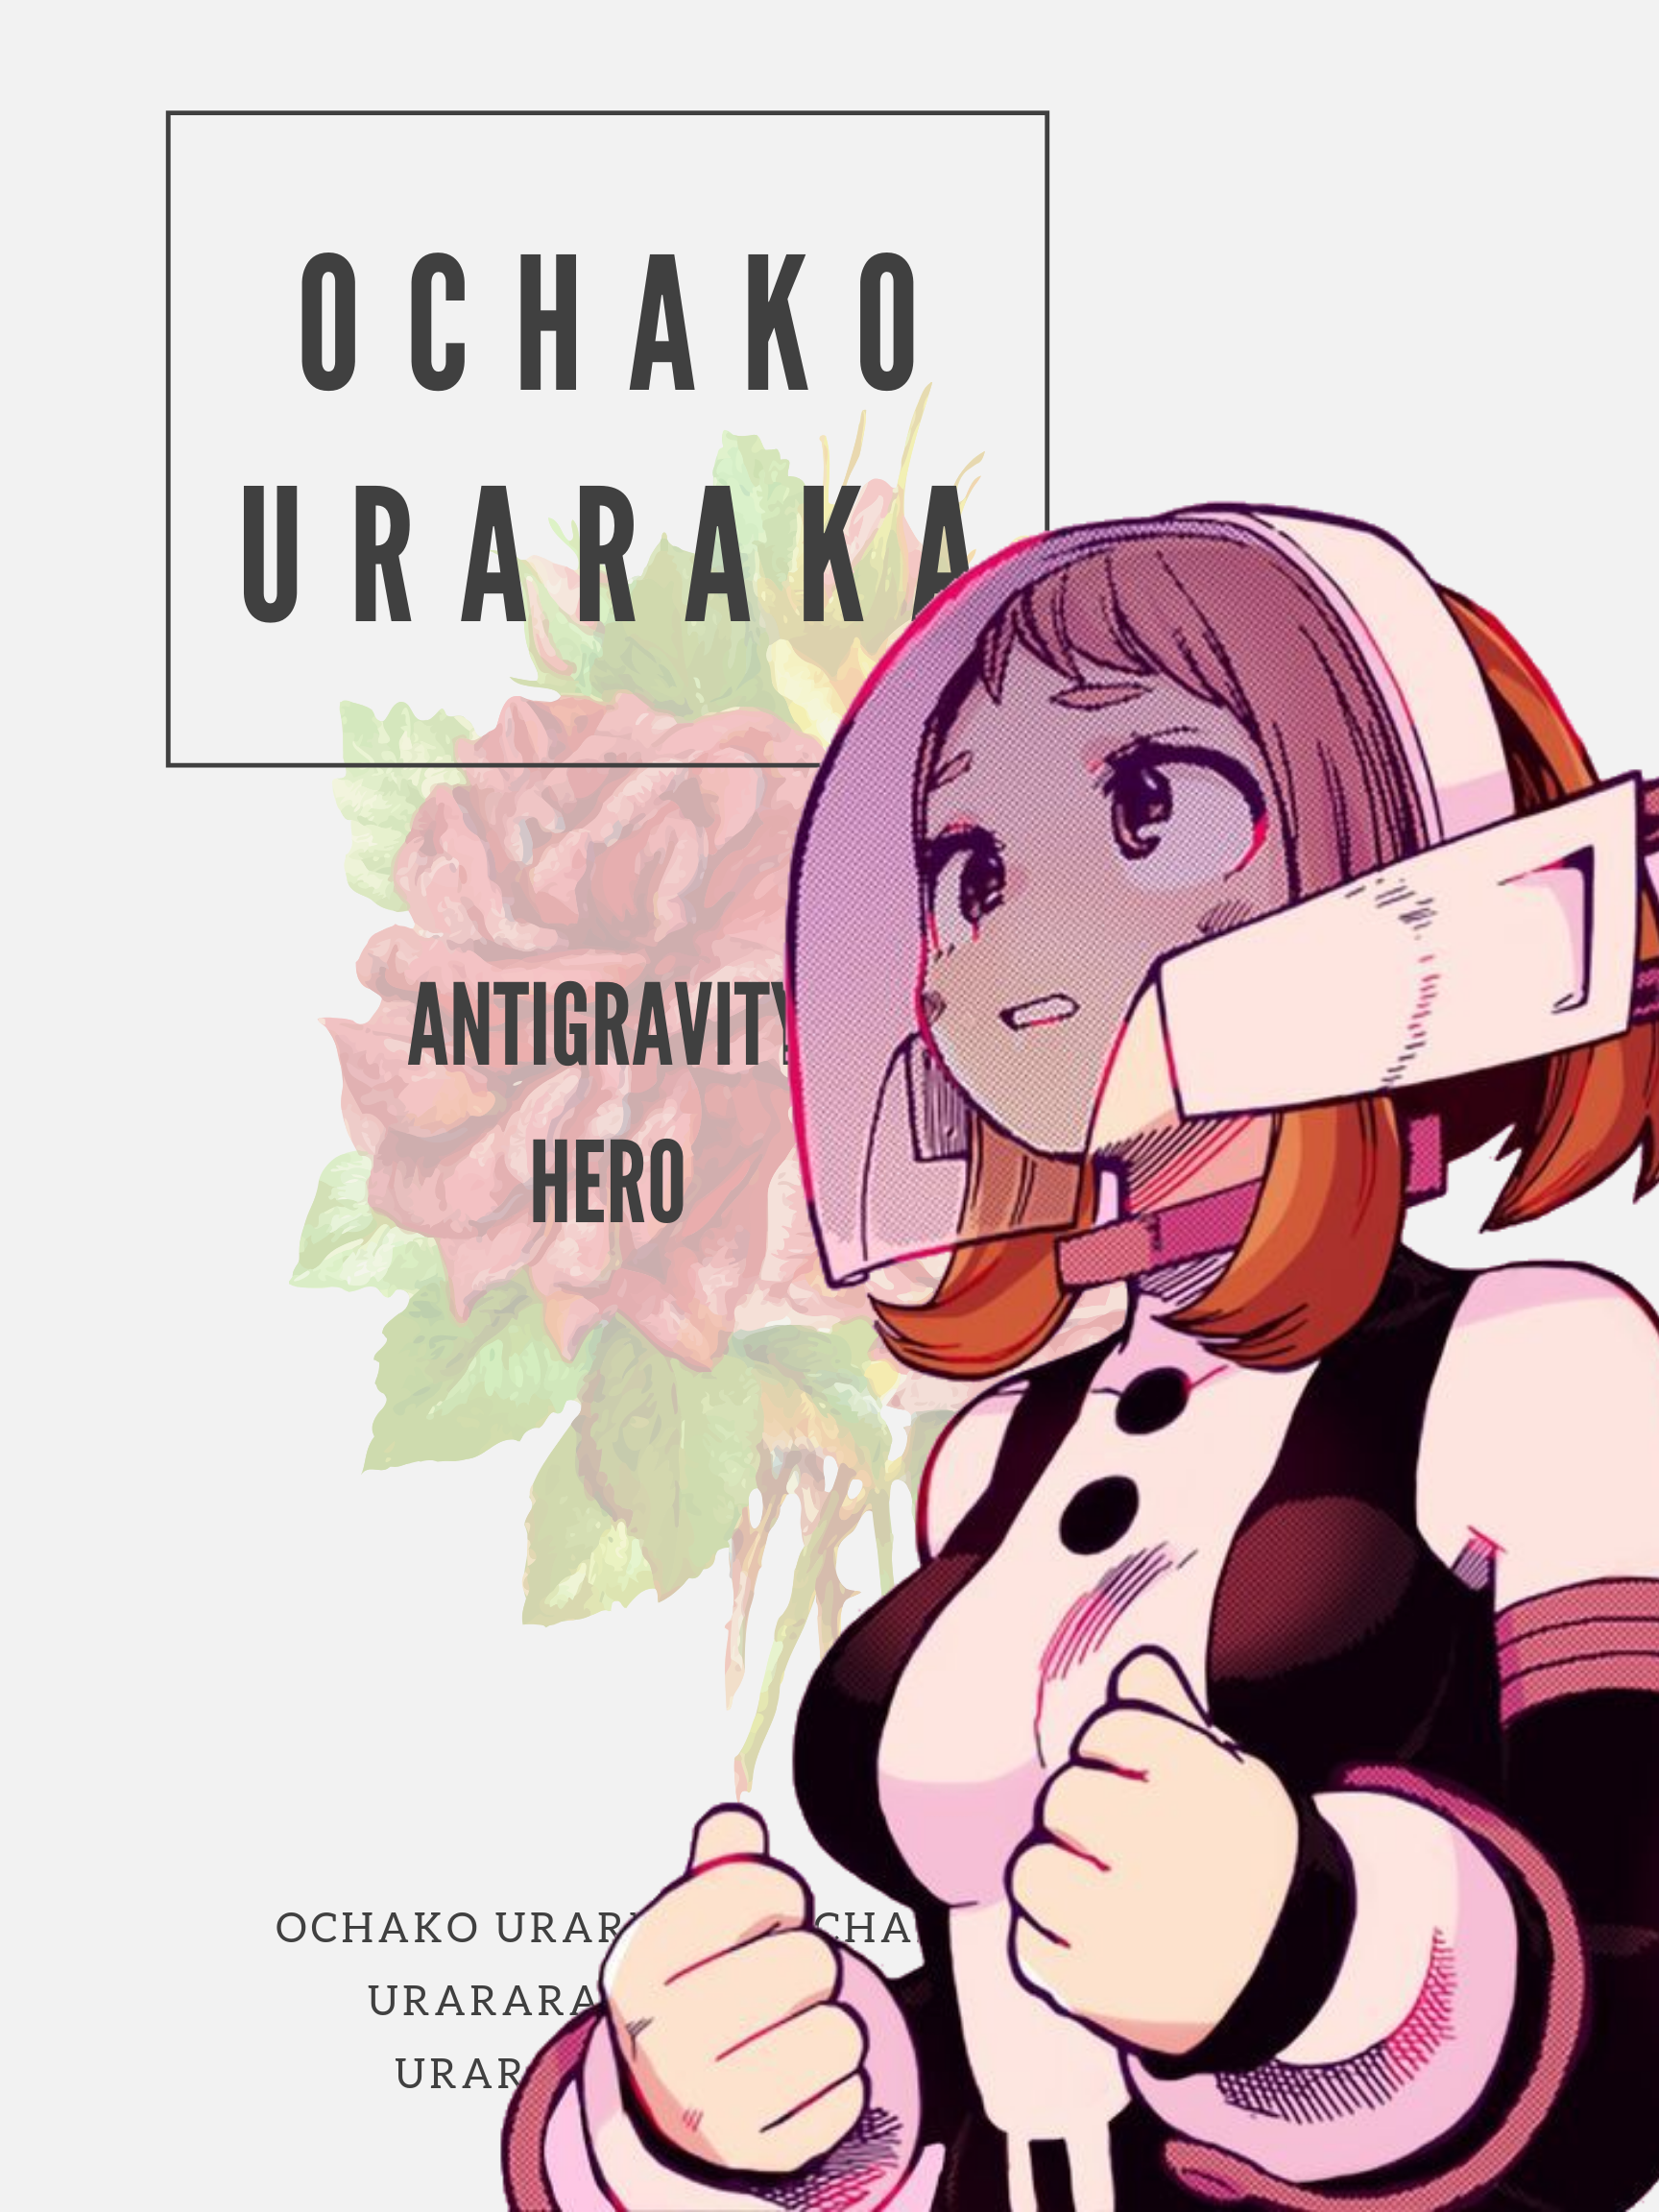 Ochako Uraraka Aesthetic Anime Wallpaper Anime Hero